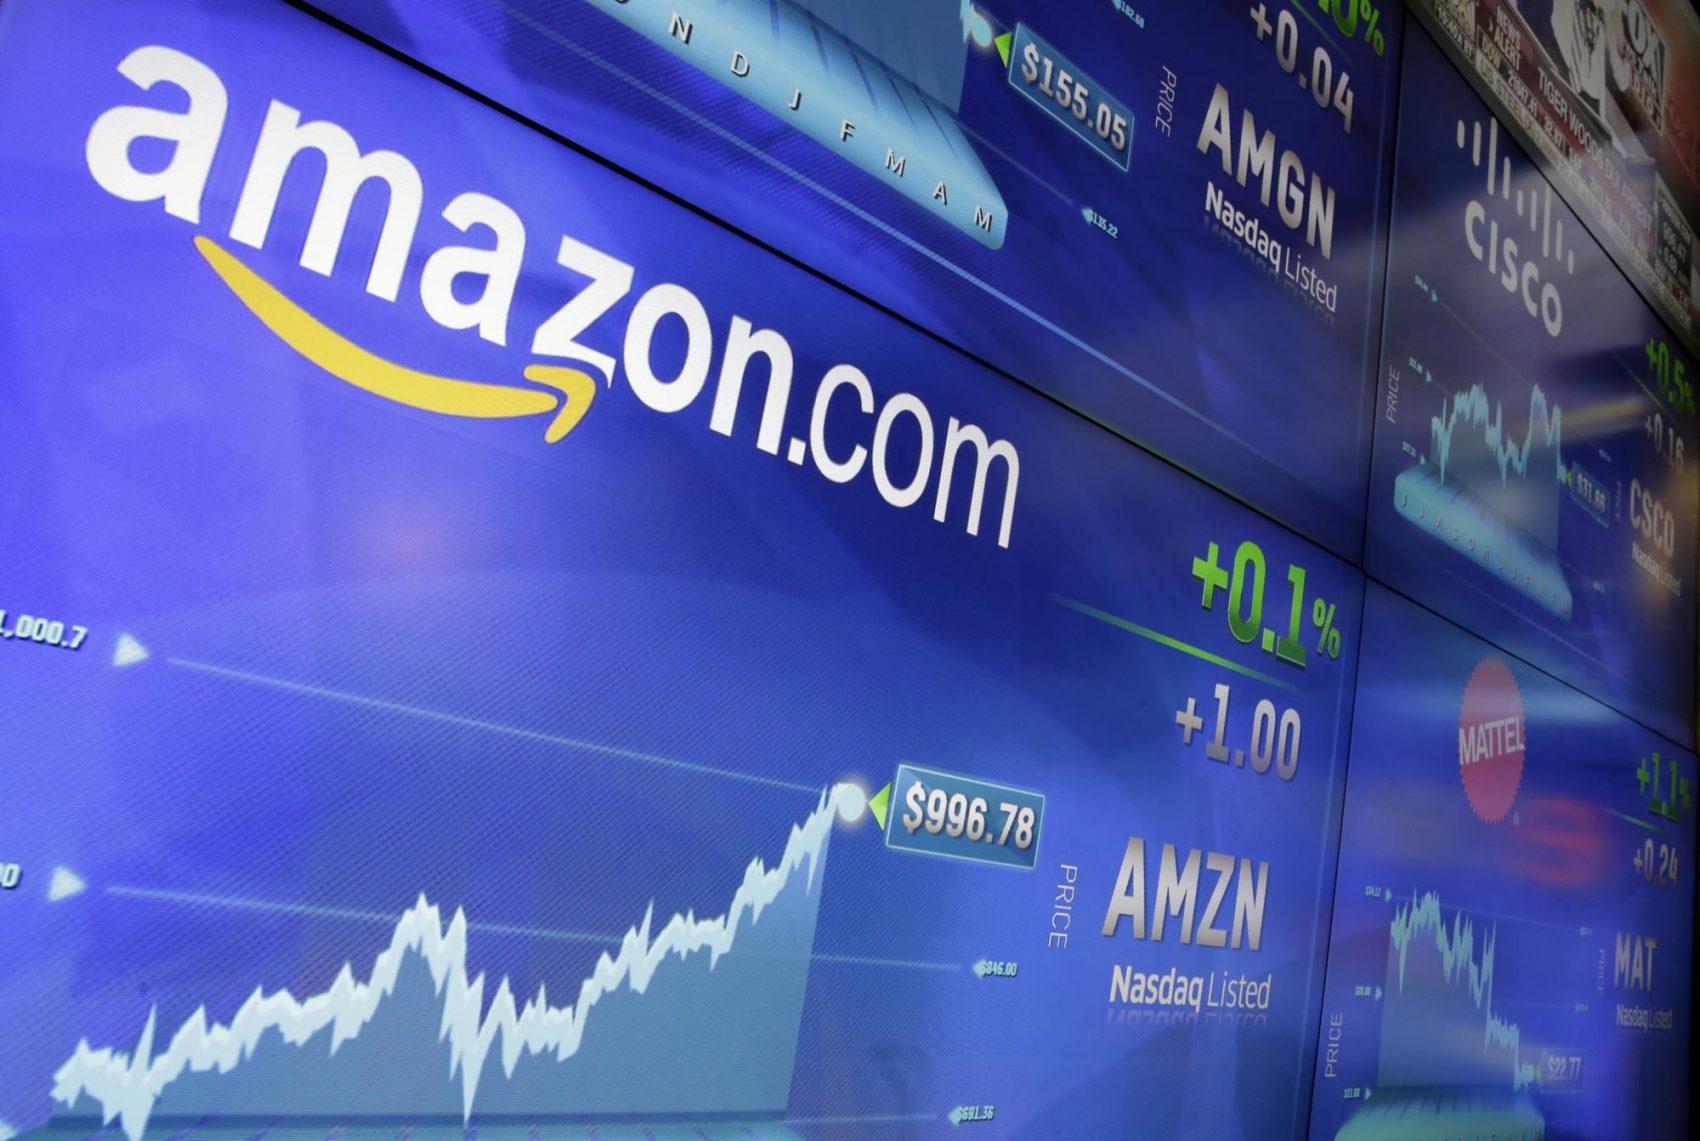 The Amazon logo is displayed at the Nasdaq MarketSite in New York's Times Square. (Richard Drew/AP File)